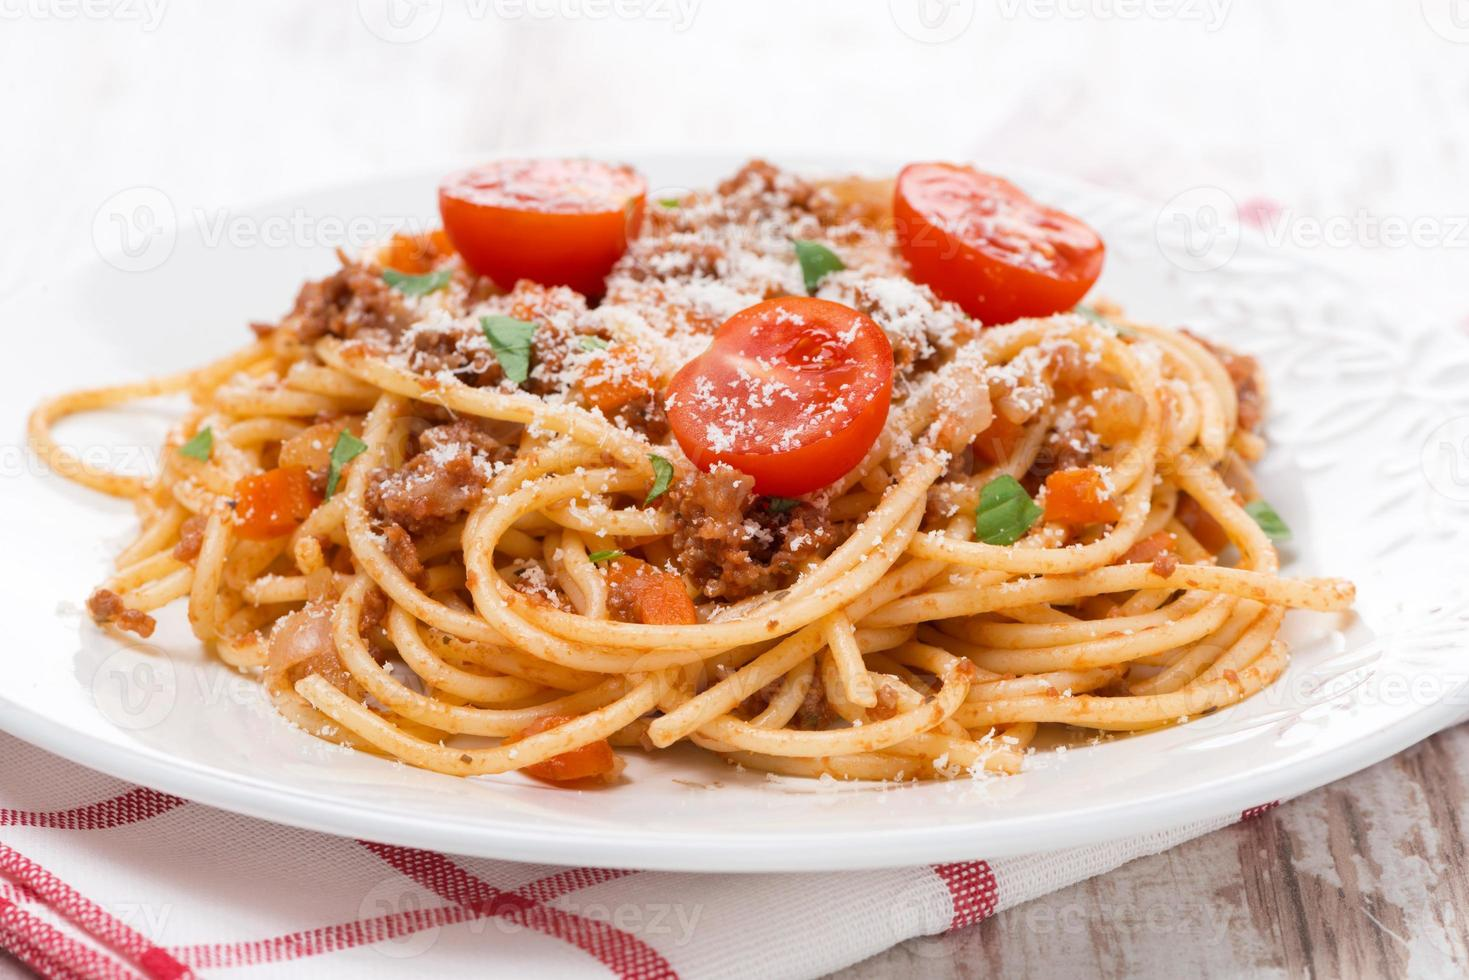 Italiaanse pasta - spaghetti bolognese op een bord foto